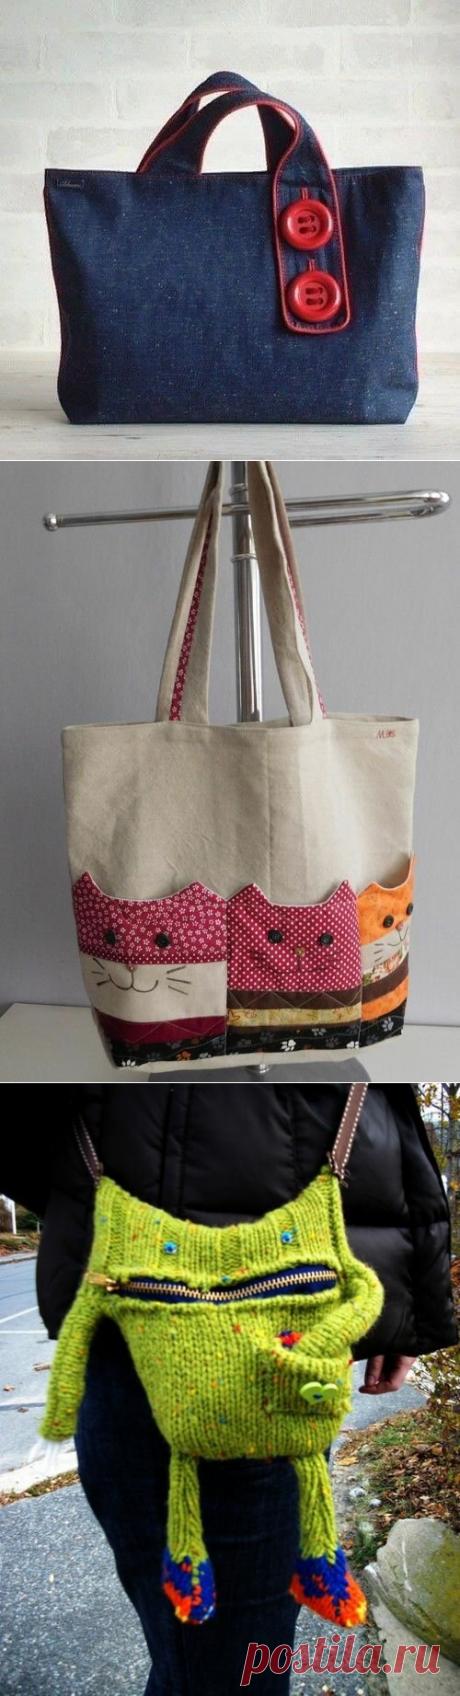 Необычные идеи handmade сумок.   Handmade для всех   Яндекс Дзен